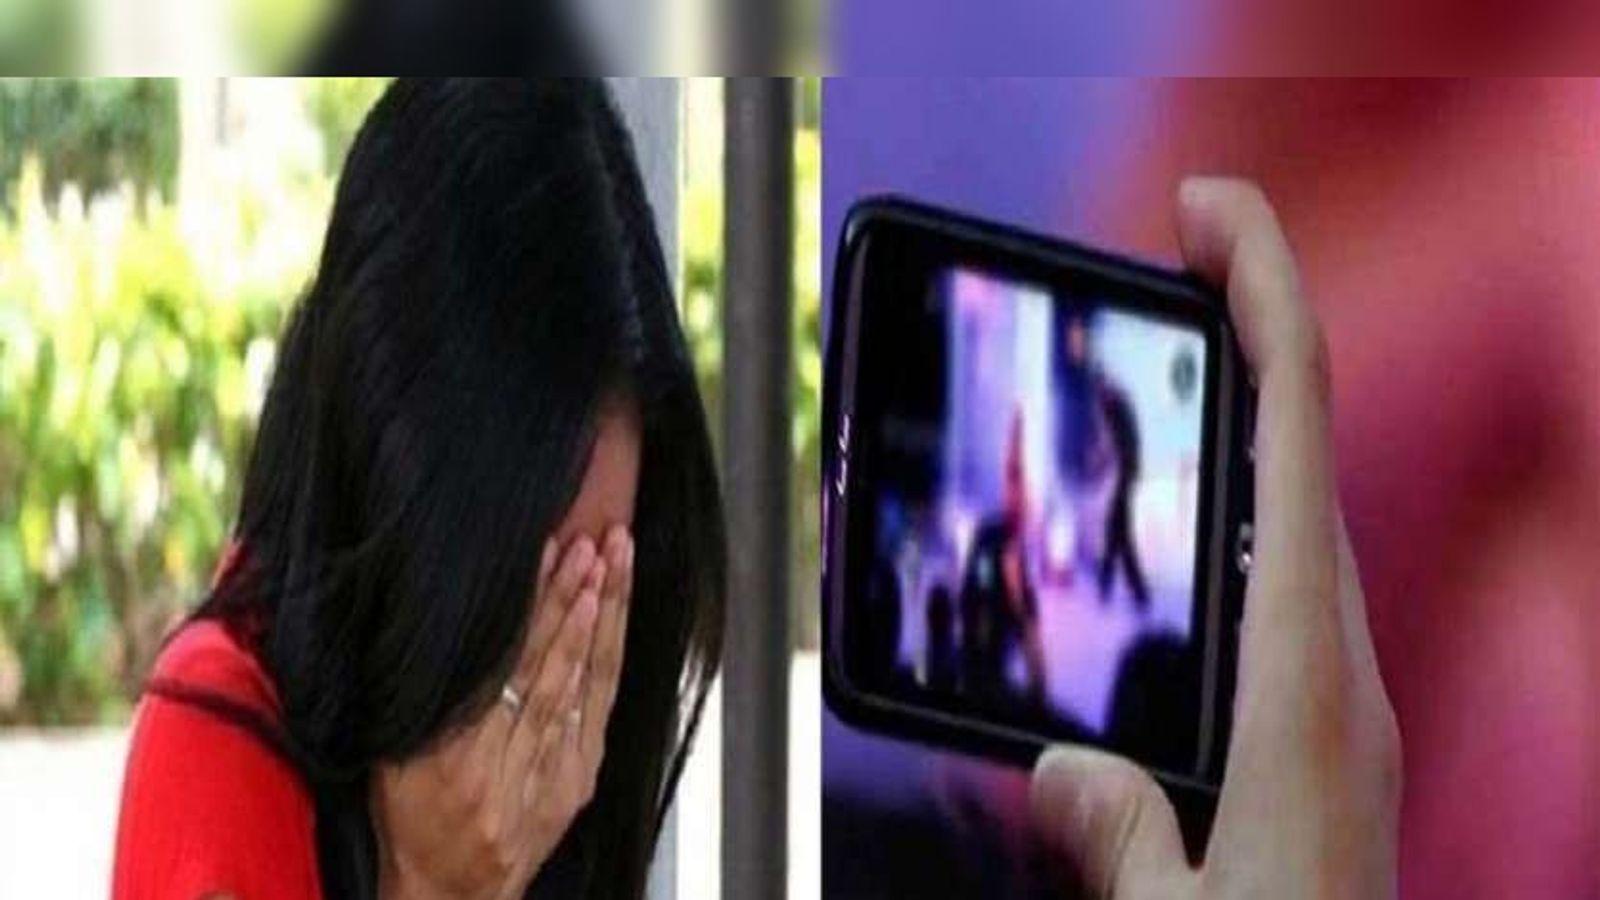 बेहोश कर अश्लील वीडियो बनाया, ब्लैकमेलिंग से परेशान विवाहिता करने जा रही थी खुदकुशी, रिश्तेदार ने देखा तो हुआ खुलासा|नागौर,Nagaur - Dainik Bhaskar